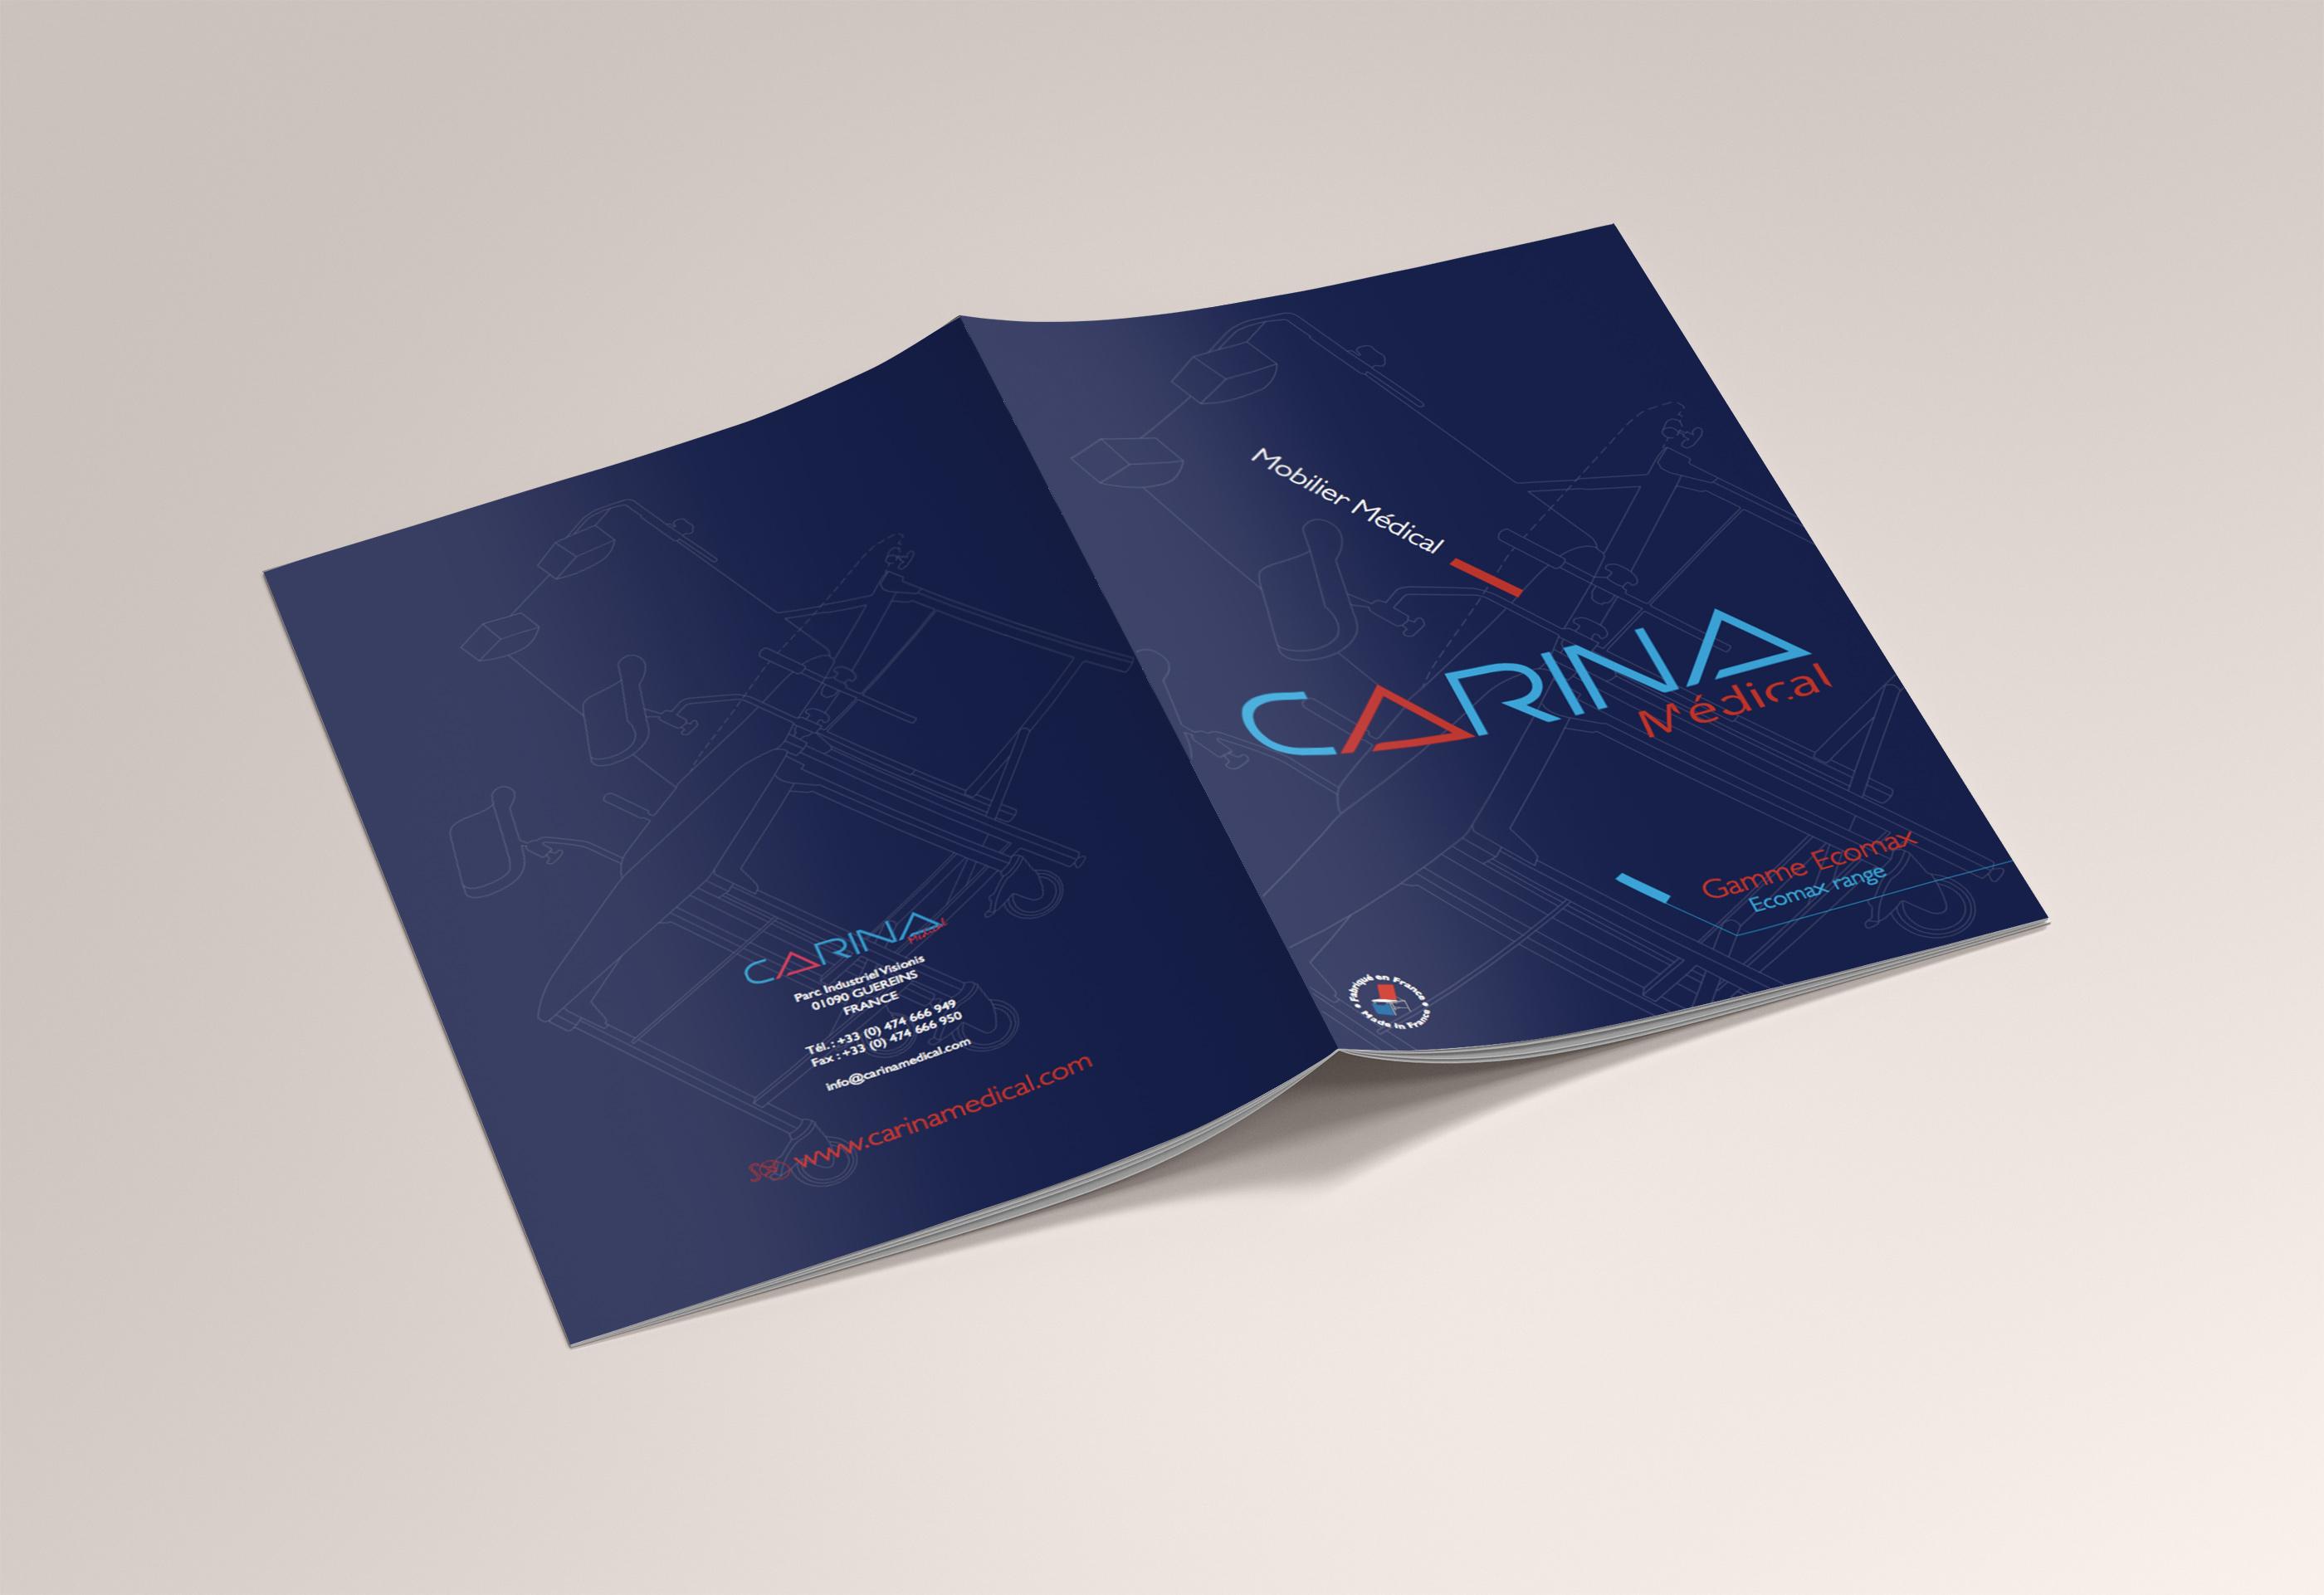 Carina_Mockup_dossier-